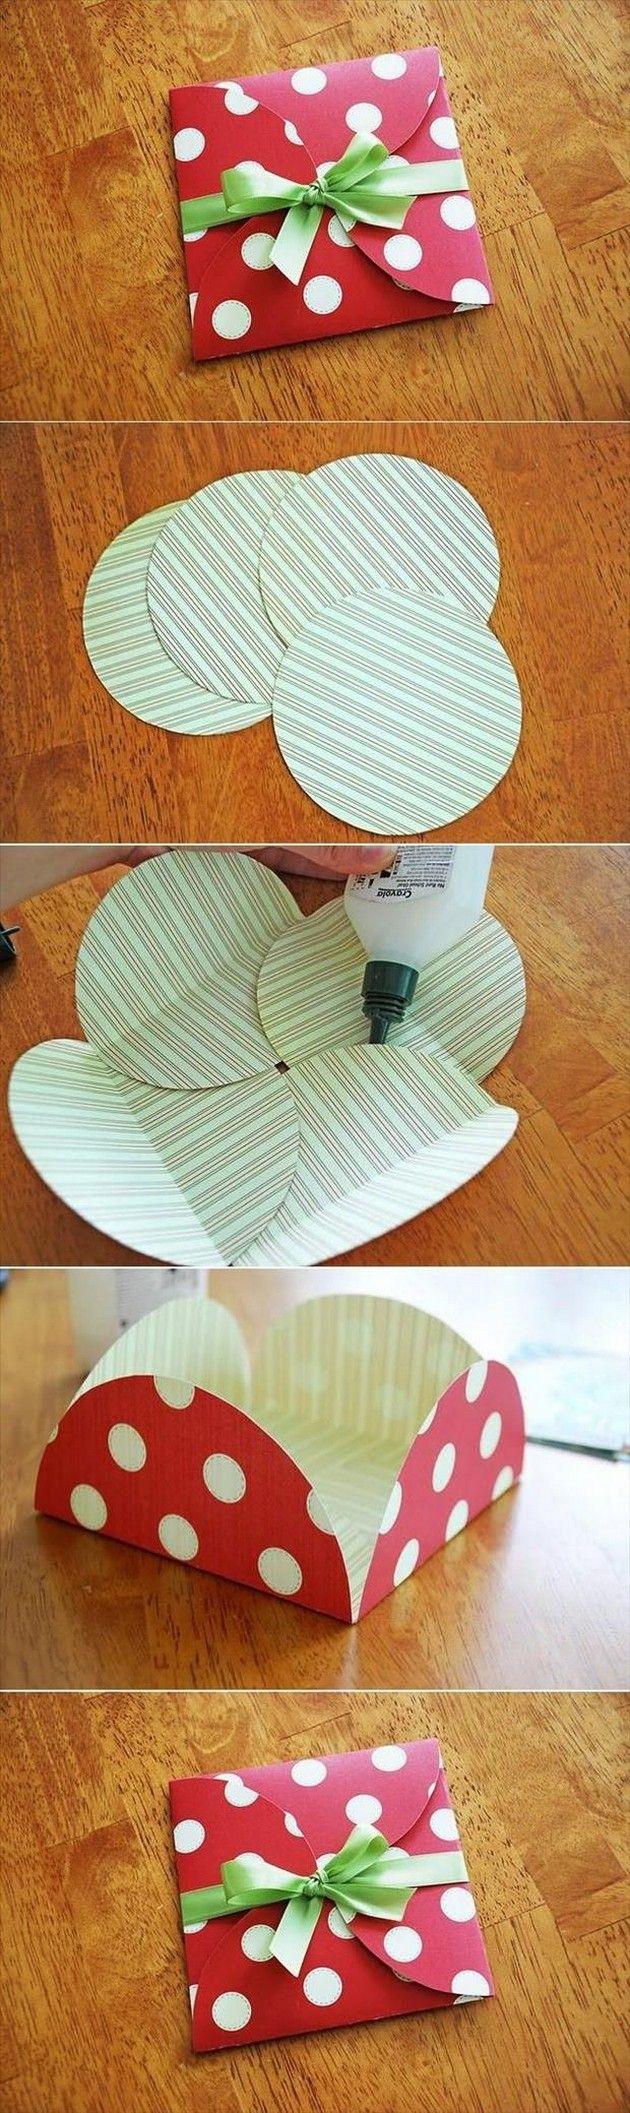 Craft and DIY Ideas